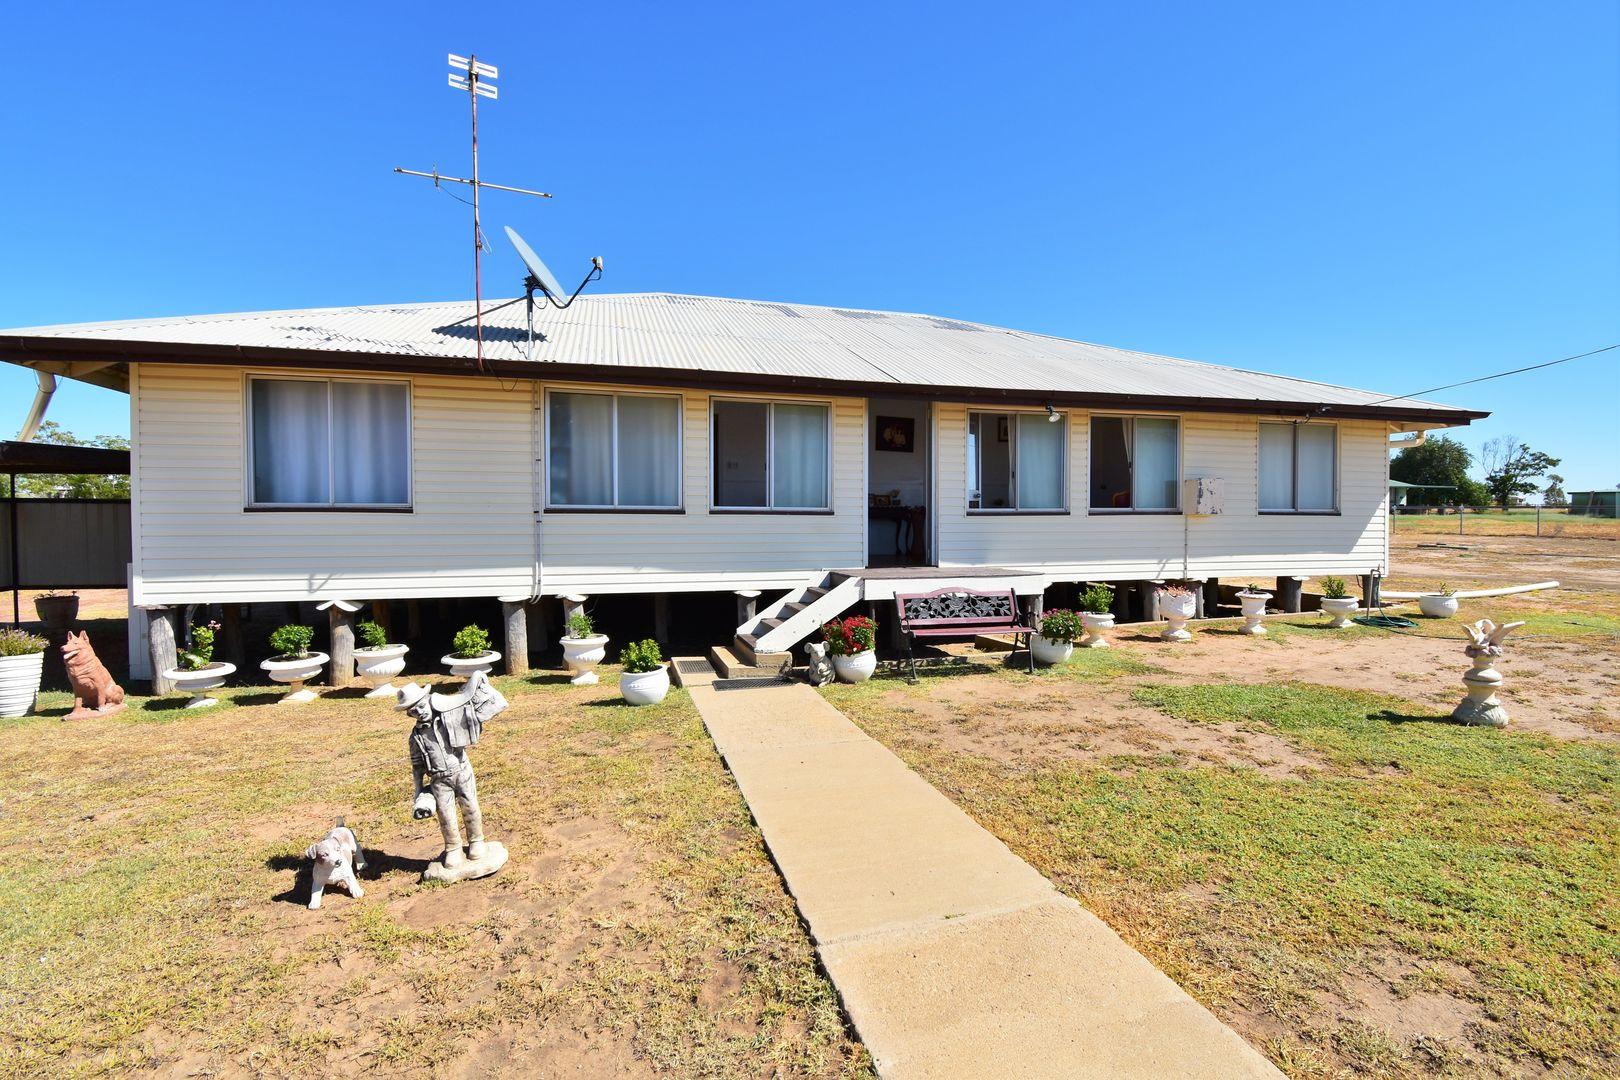 38-40 Boundary Street, Aramac QLD 4726, Image 0